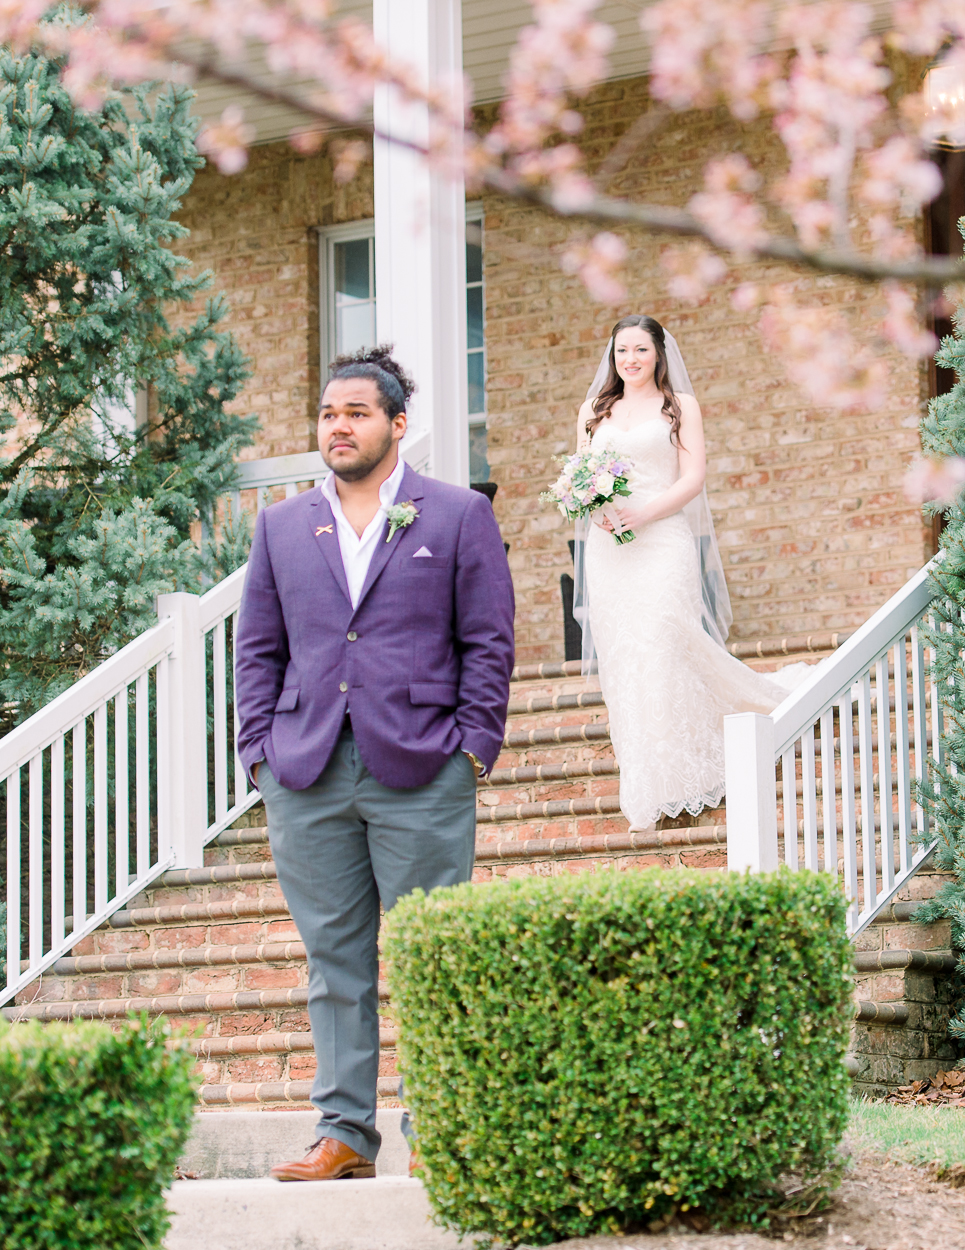 BigCork_vineyard wedding_virginiaweddingphotographer_youseephotography_SarahJames (44).JPG